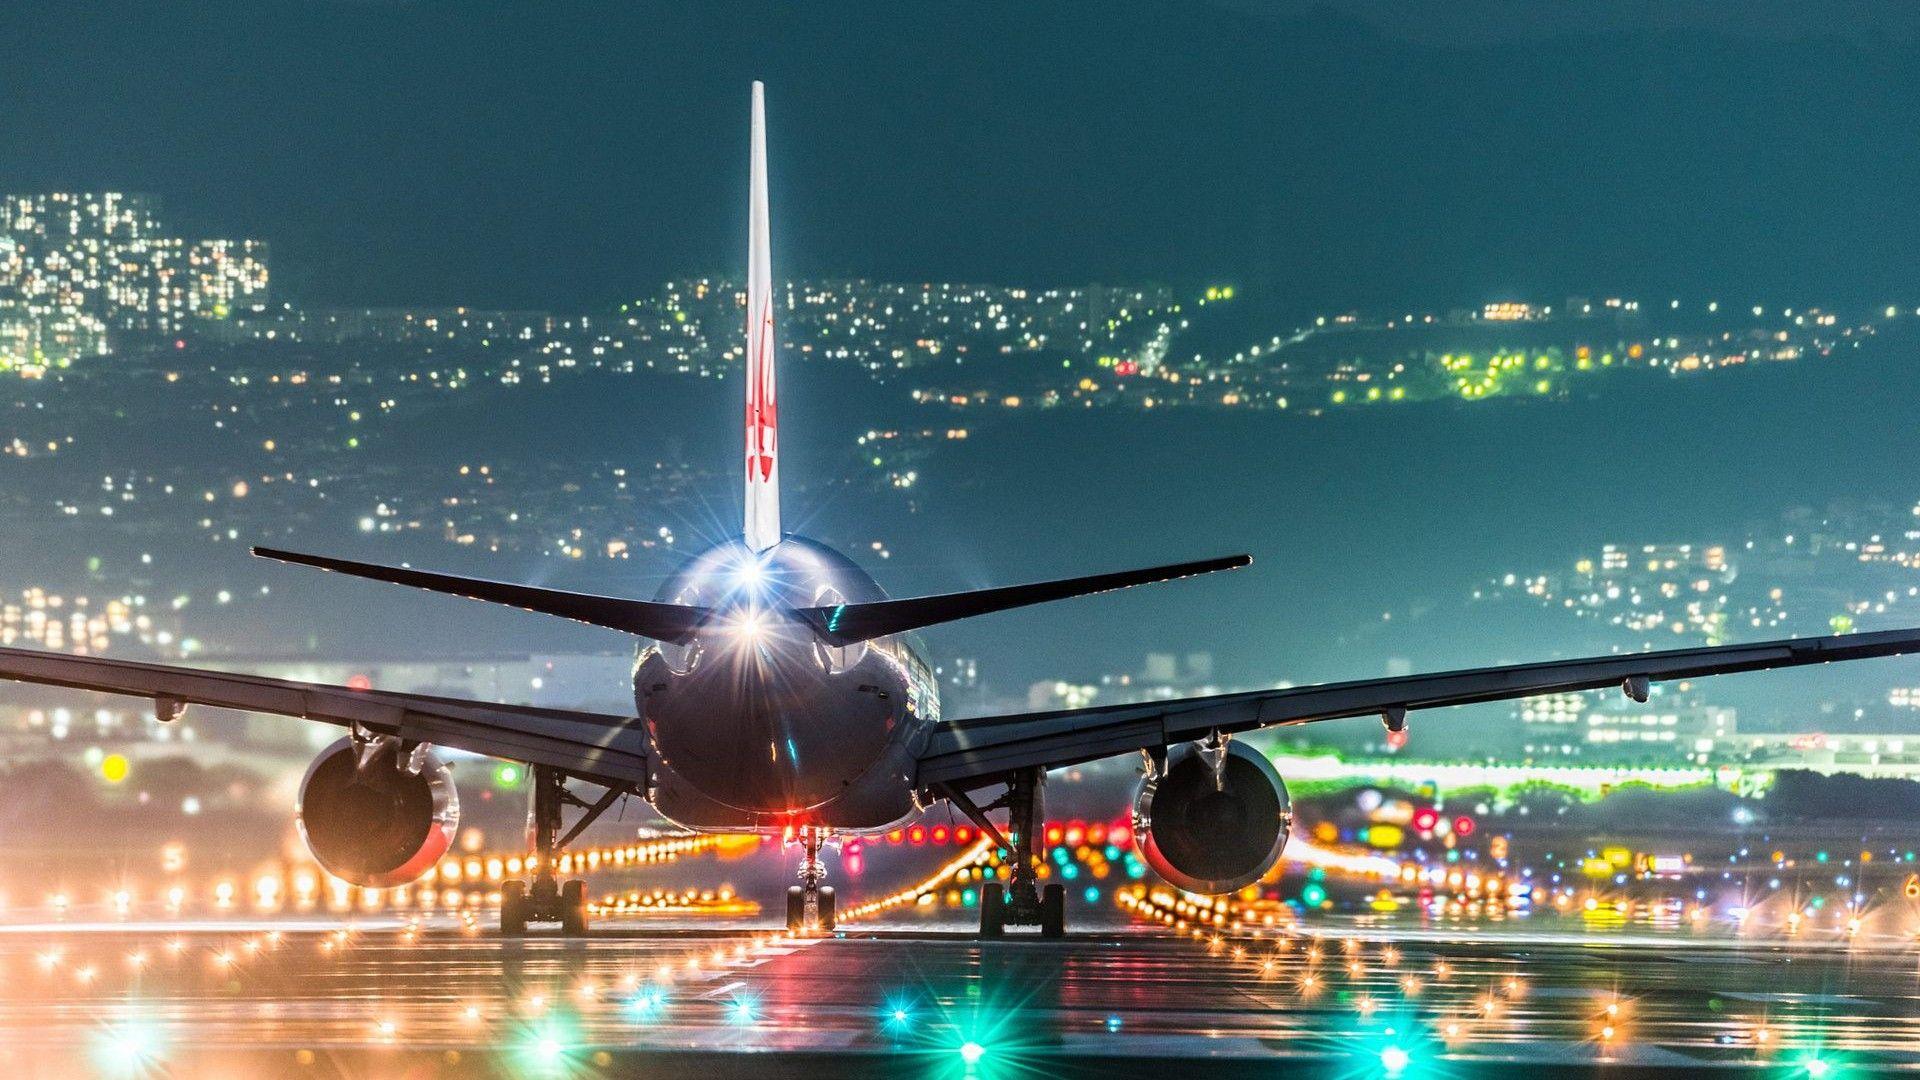 Airplane Flight Hd Wallpaper Free Download For Desktop Foto Aviao Aeroporto Cacas